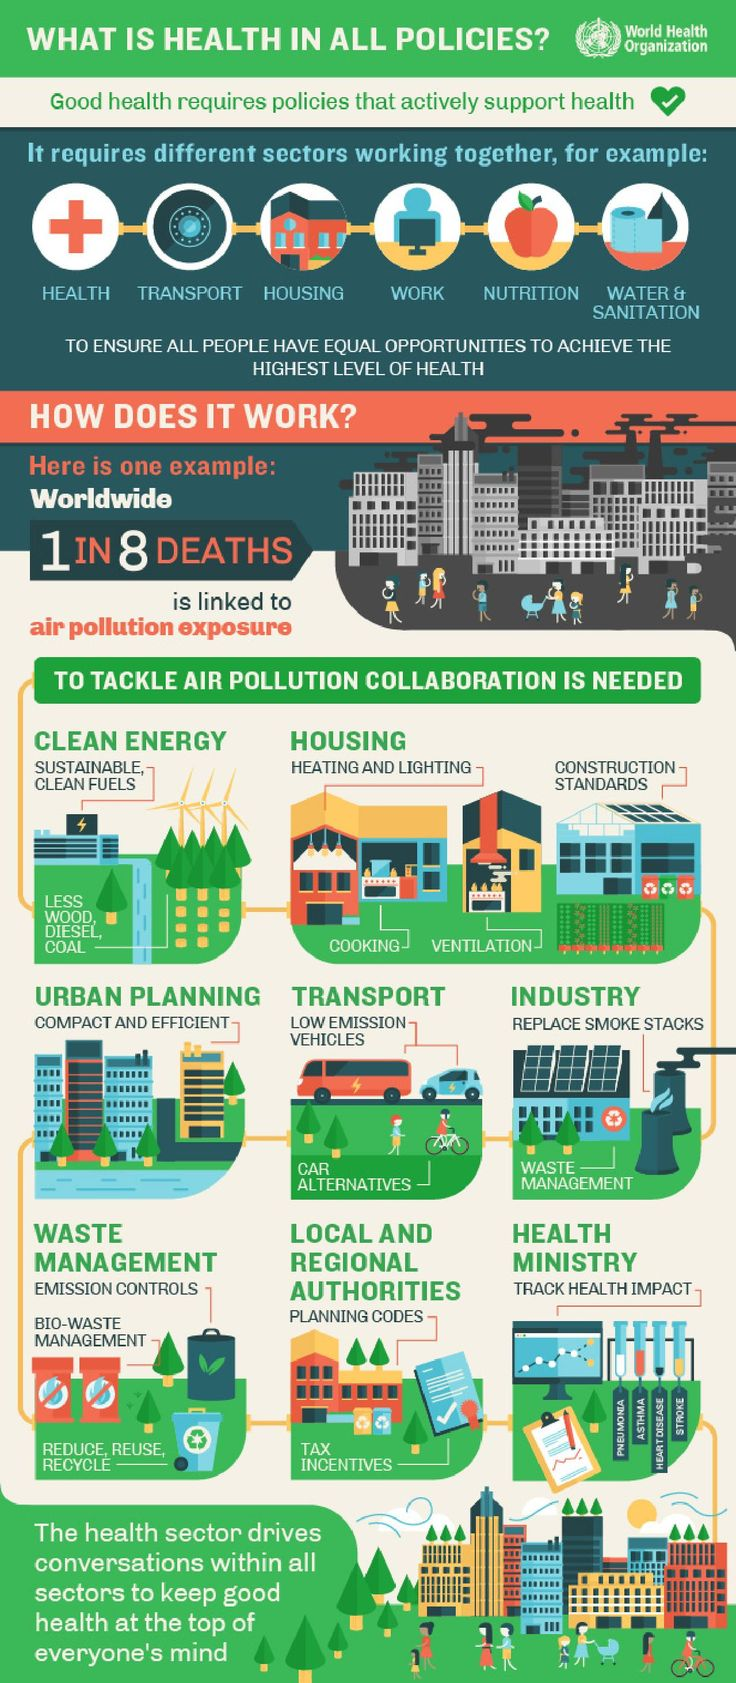 NEHAP MALAYSIA | Public health, environmental and social determinants of health